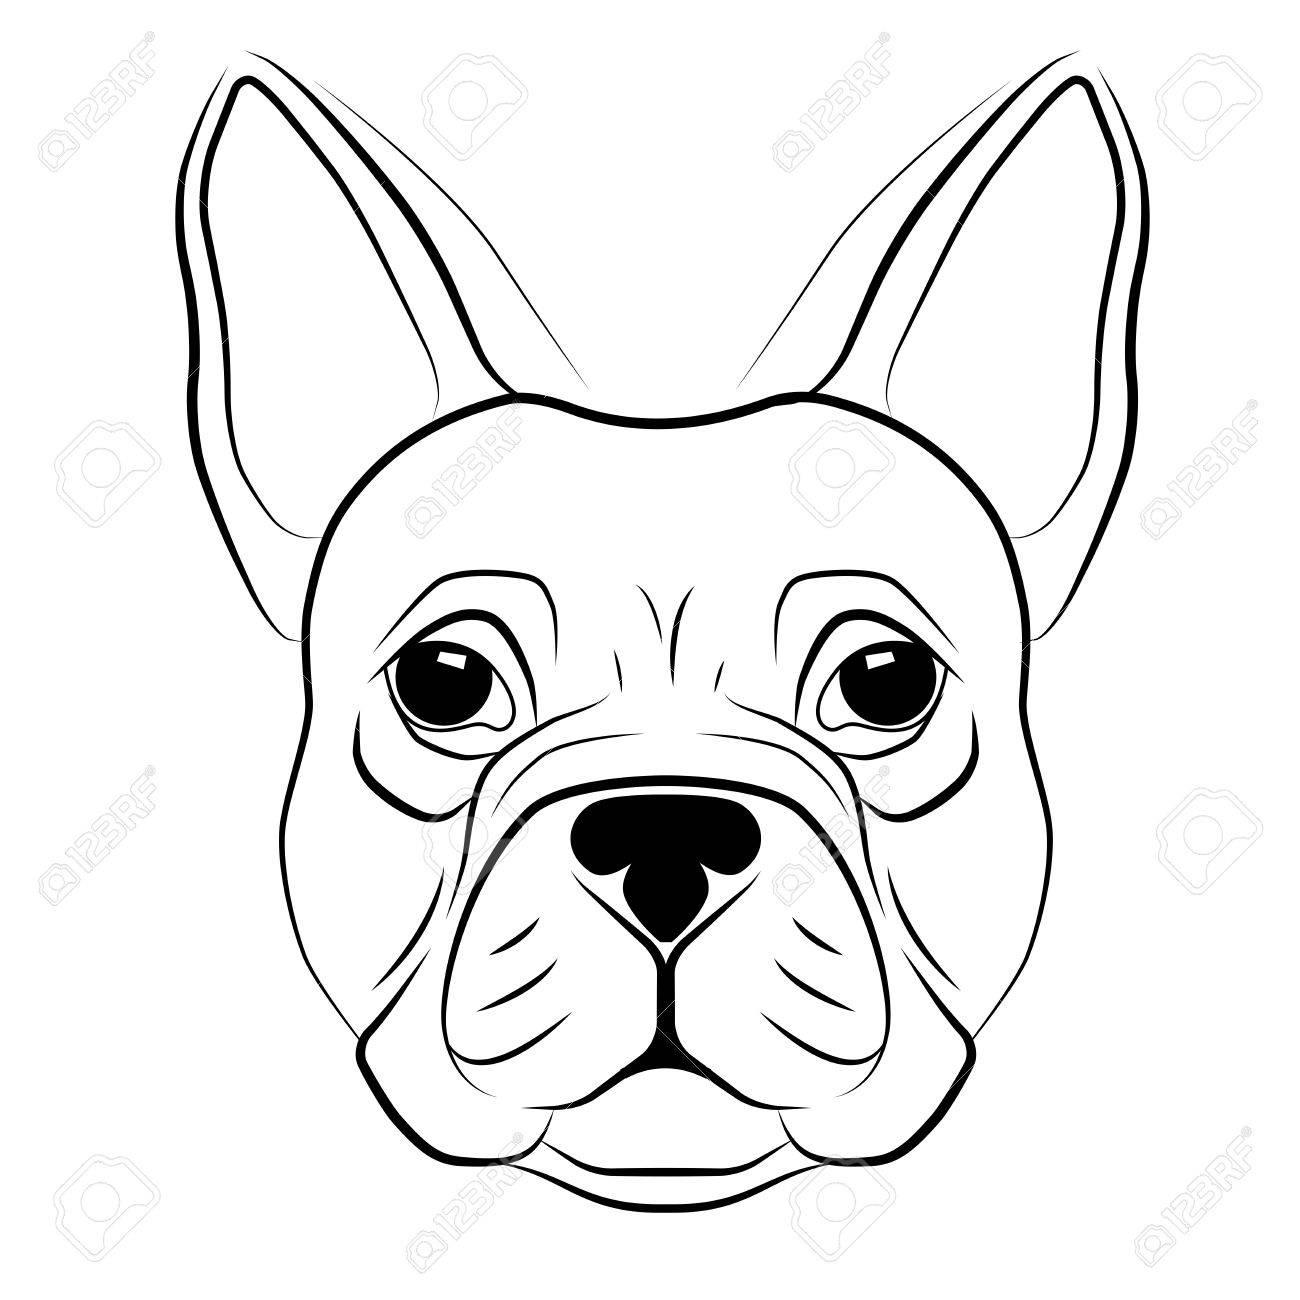 Bulldog Head Drawing At Getdrawings